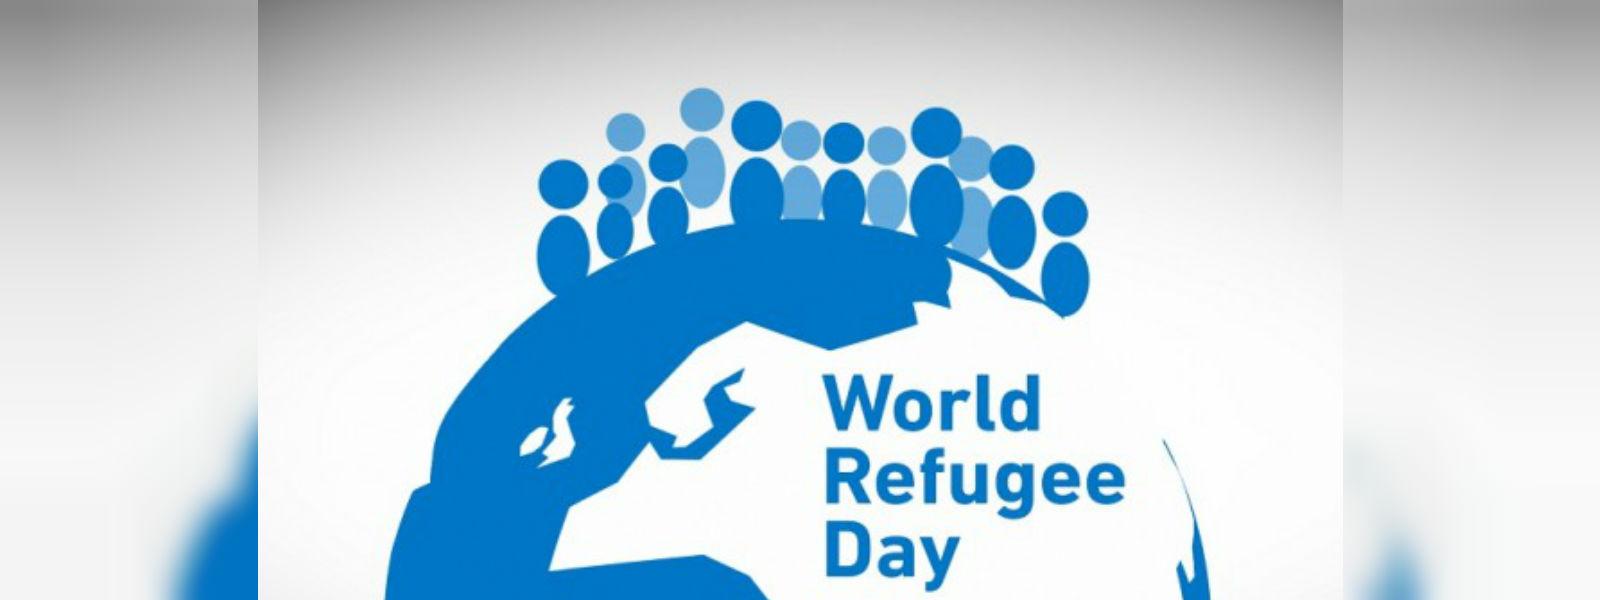 Today marks the World Refugee Day; 1610 refugees in Sri Lanka